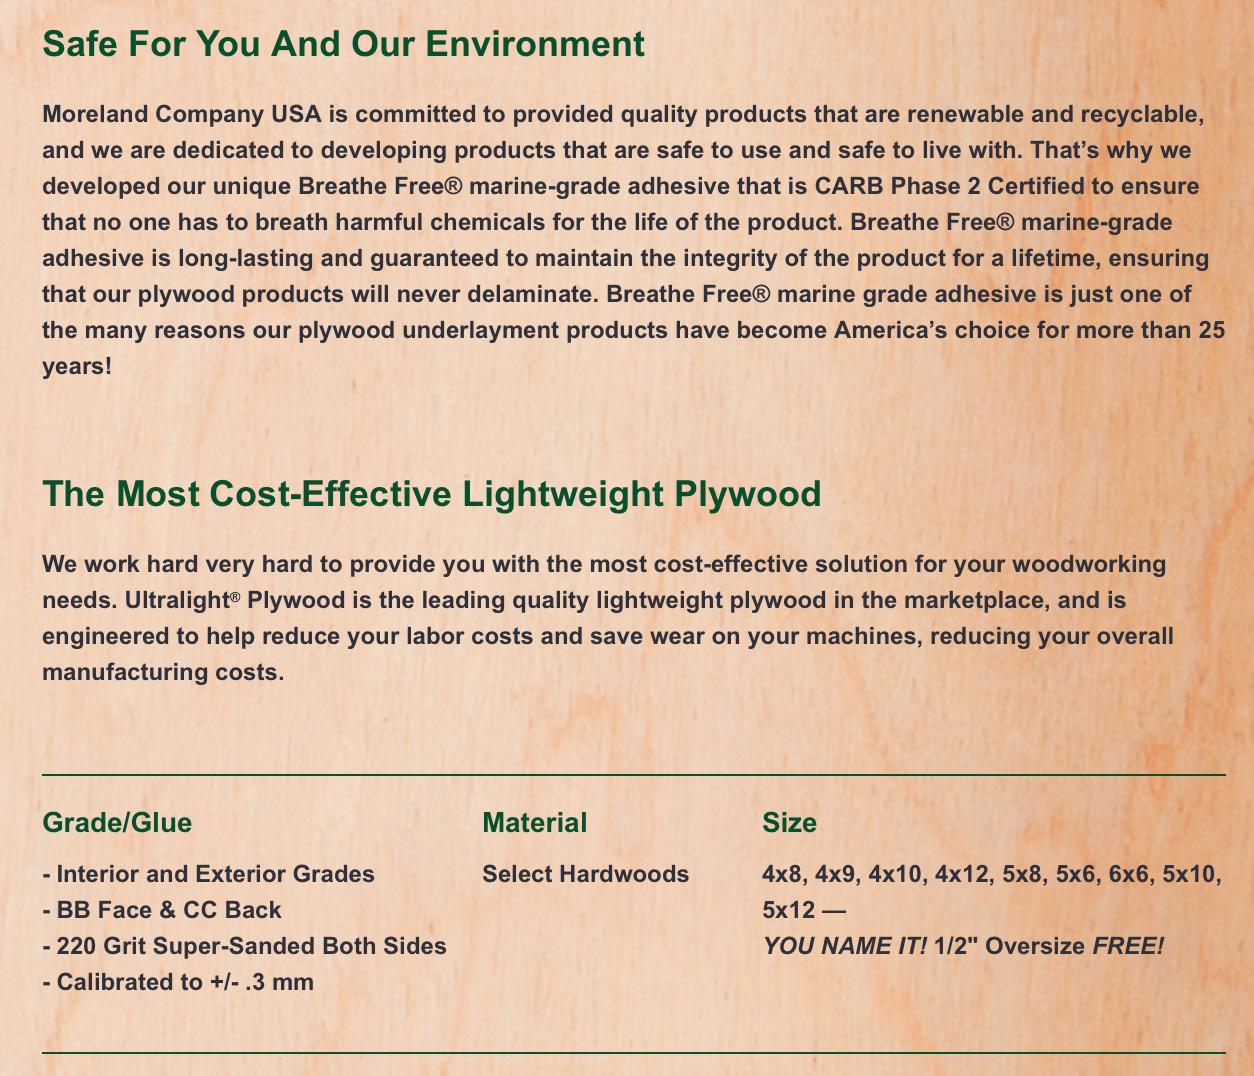 UltraLight by Moreland Company USA | Rethinking Retail